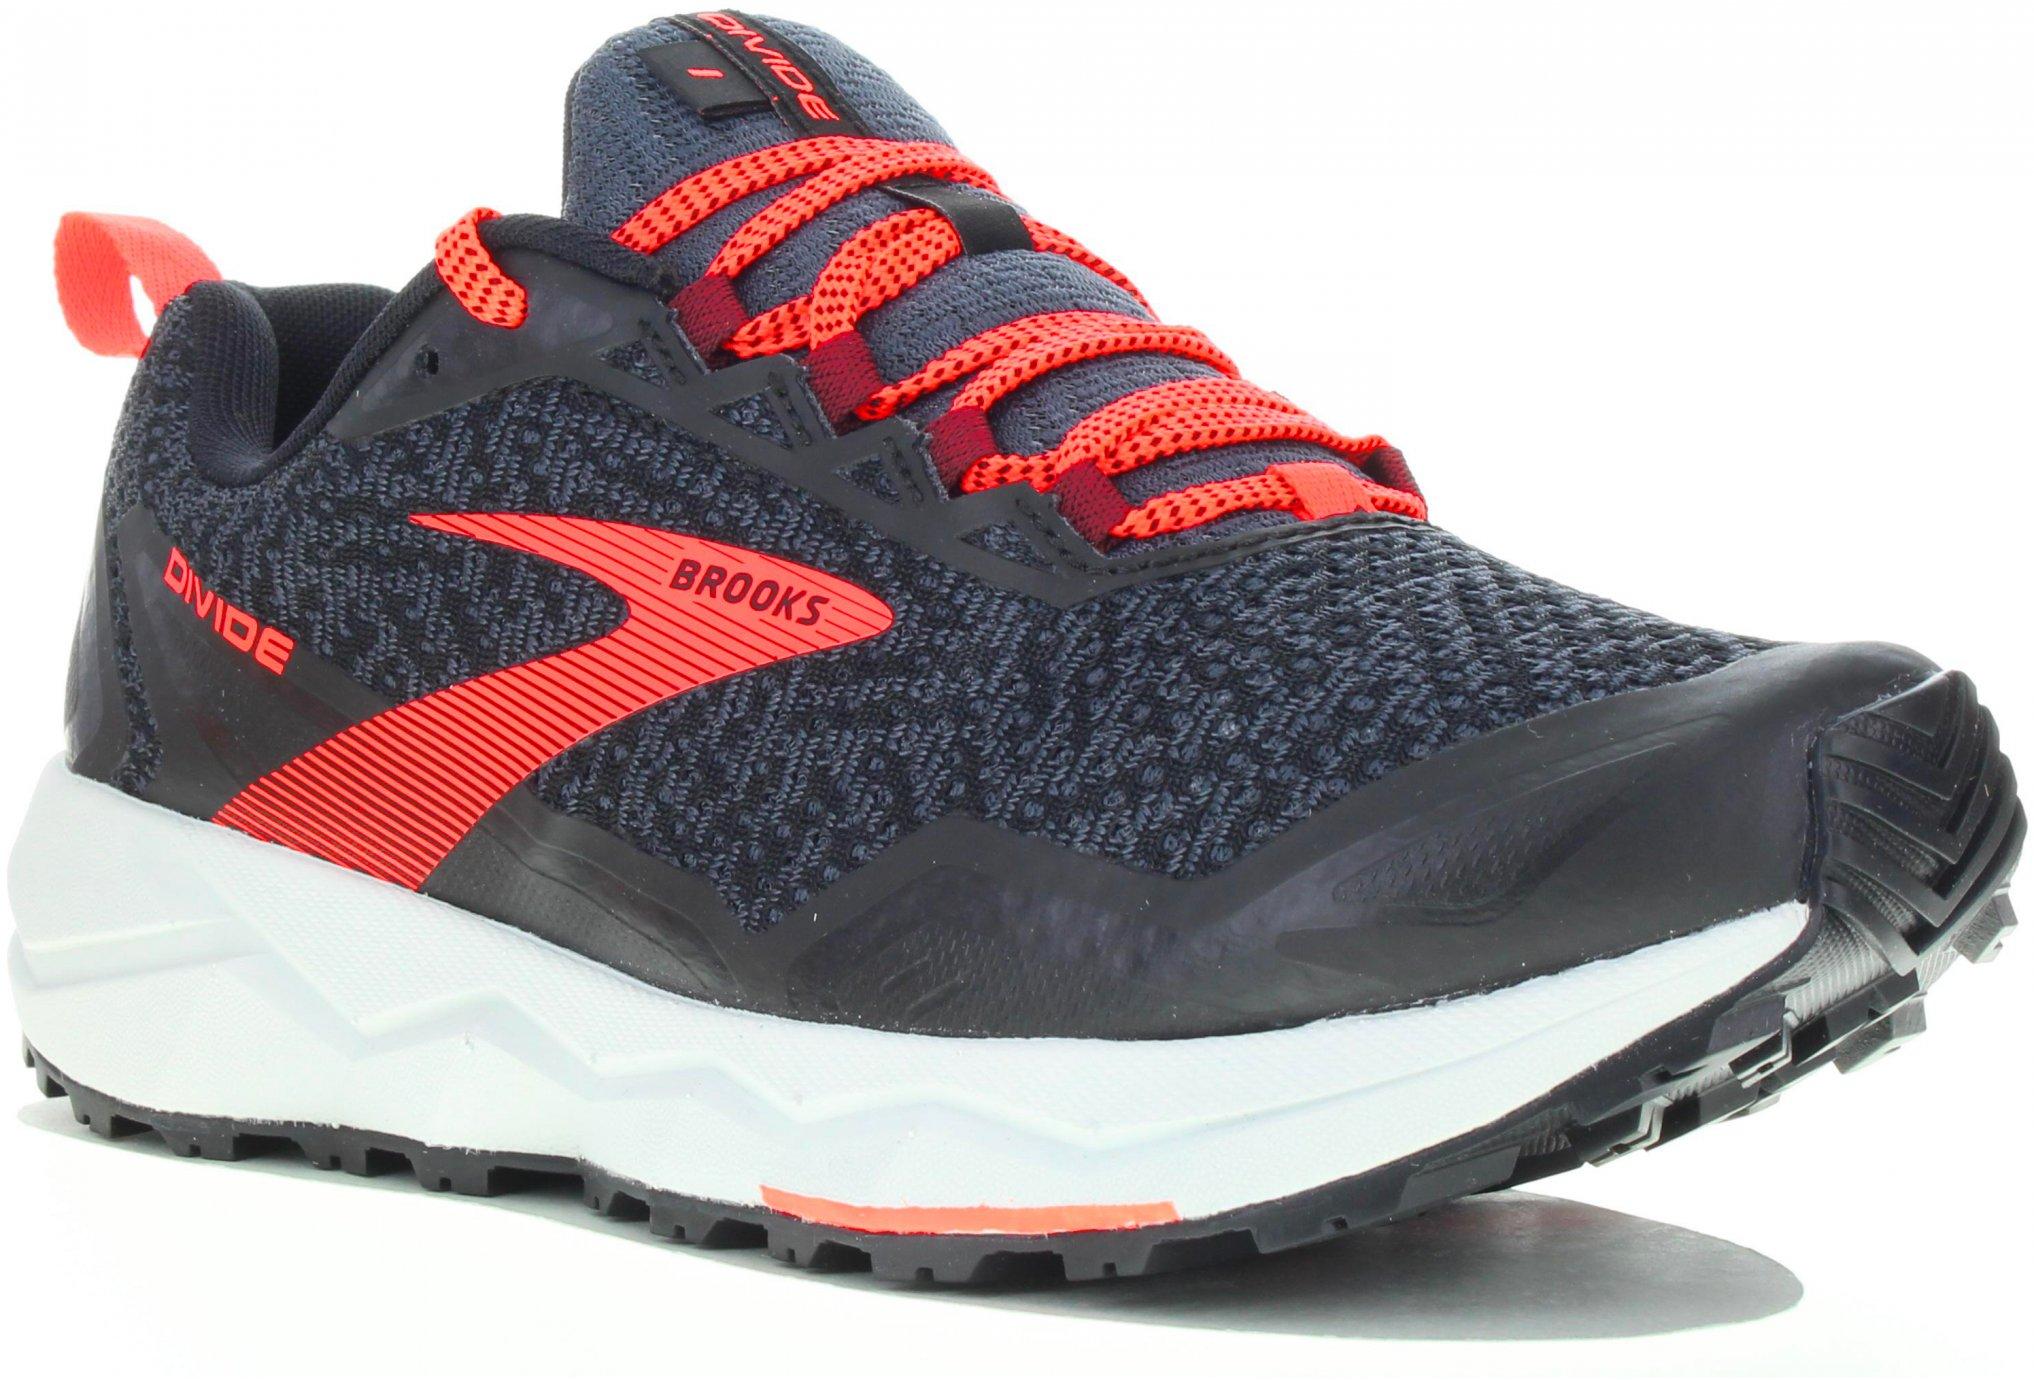 Brooks Divide W Chaussures running femme